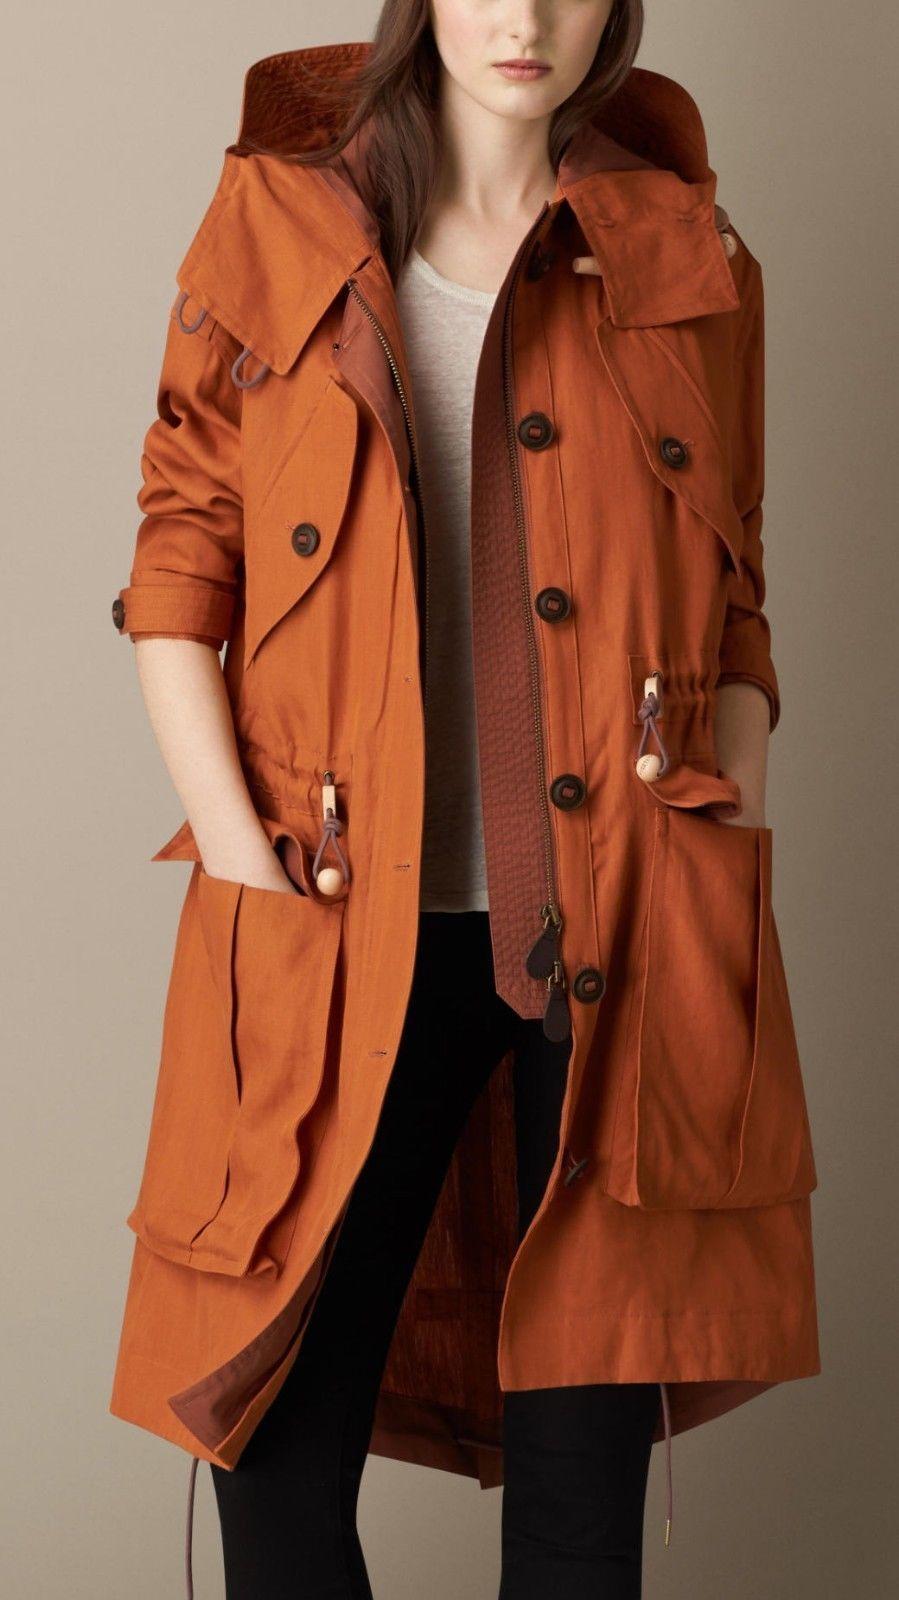 Nwt Burberry Orange Womens Nunnsmoore Linen Parka Jacket Size S Coat Abrigos De Moda Ropa De Invierno Impermeable Mujer